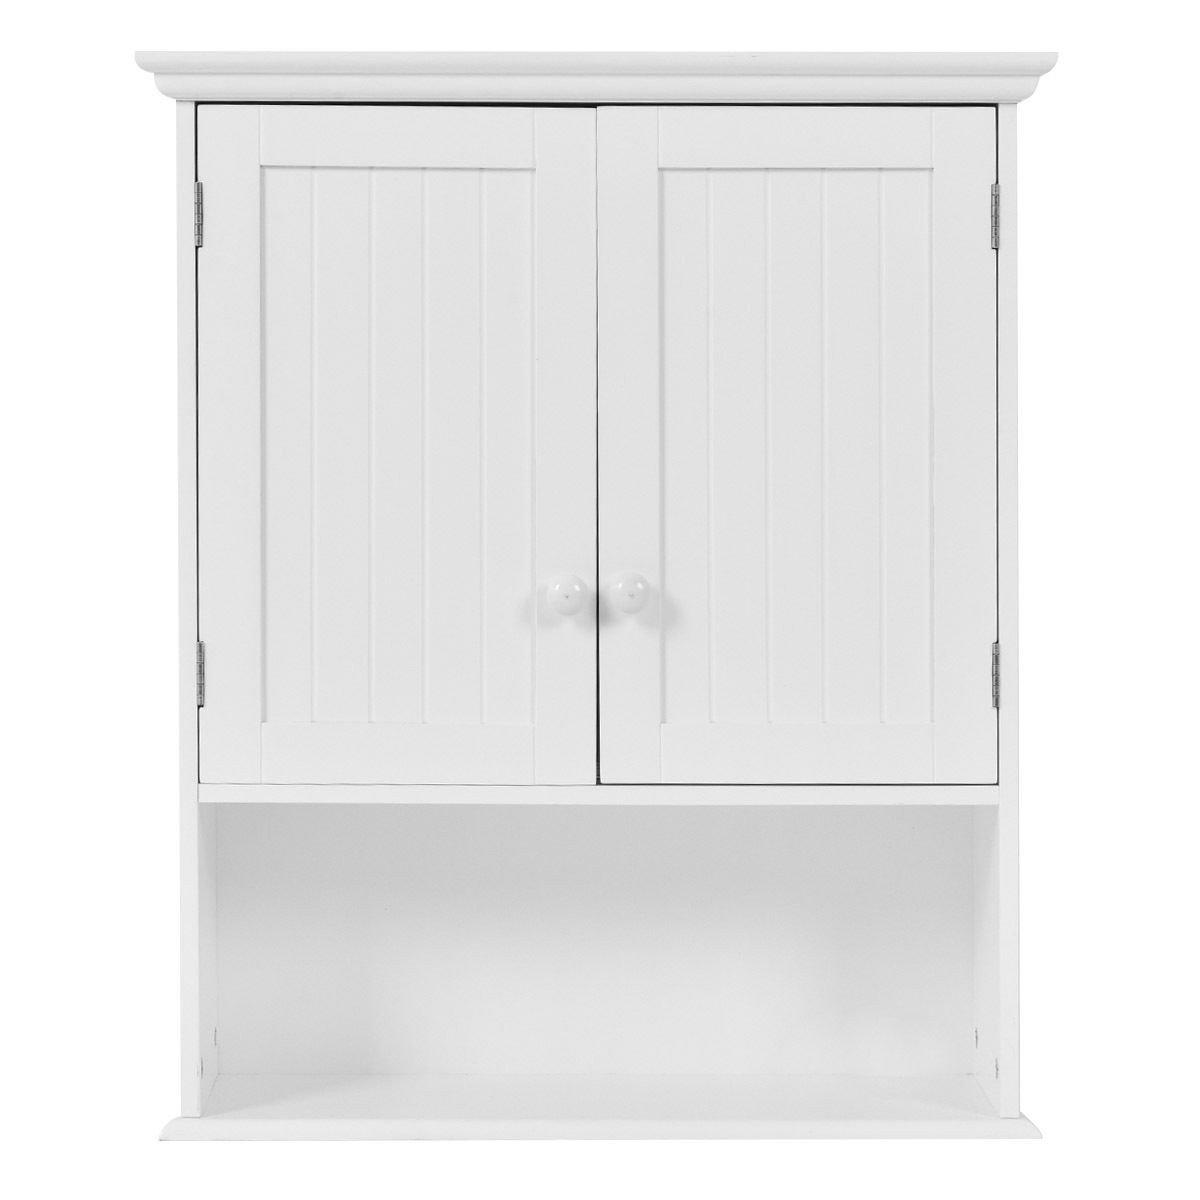 MyEasyShopping Wall Amounted Bathroom Medicine Cabinet Kitchen Storage Wood Shelf Shelves Organizer